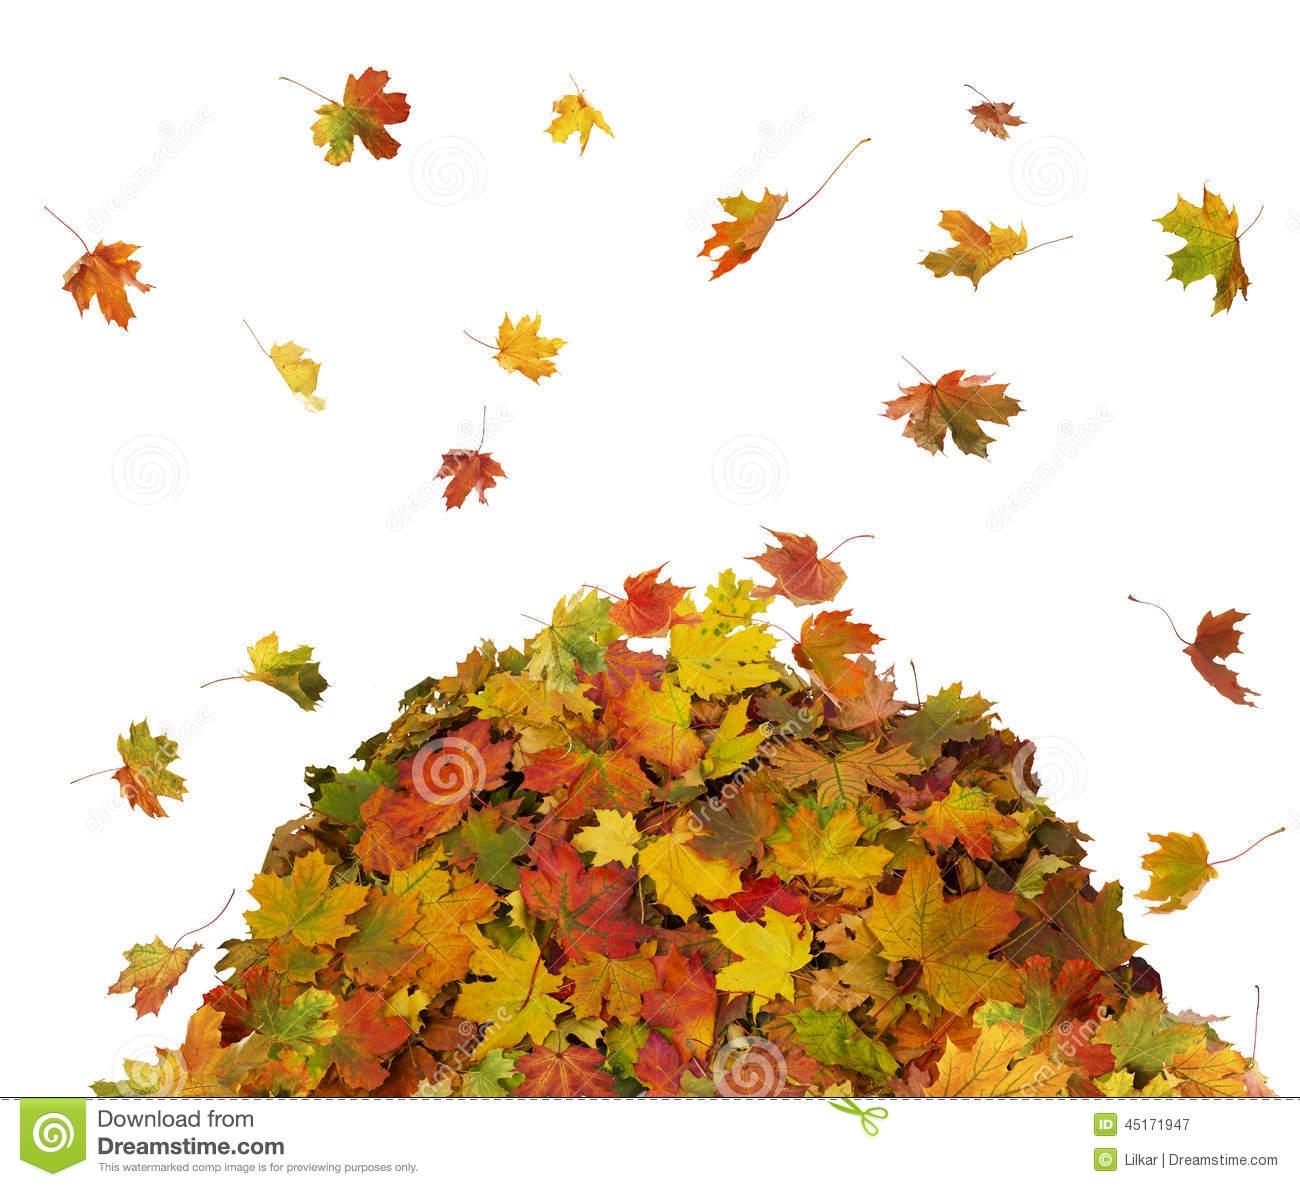 Leaf pile clipart svg freeuse stock Pin Leaf Clipart Pile Leaves #11 - 1187*1300 - Free Clipart Download ... svg freeuse stock